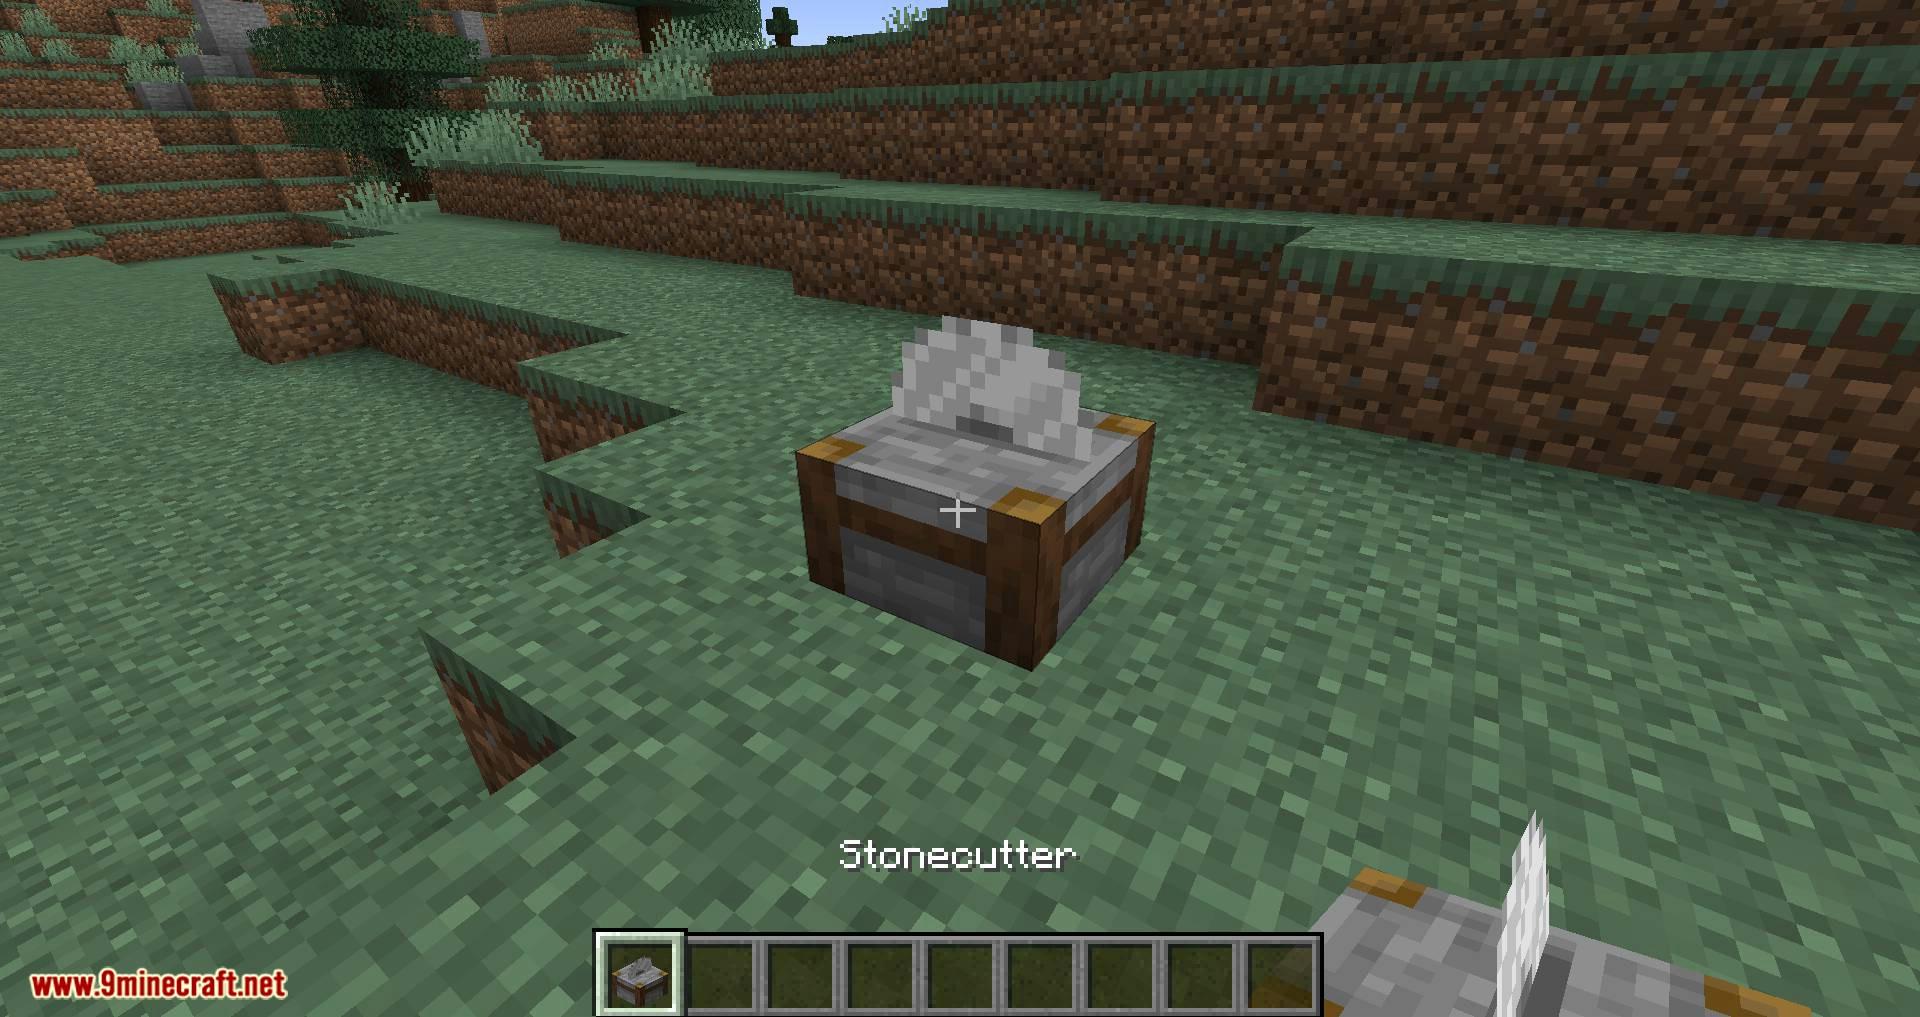 Dangerous Stone Cutter Mod 9.96.9/9.95.9 - Minecraft Mod Download